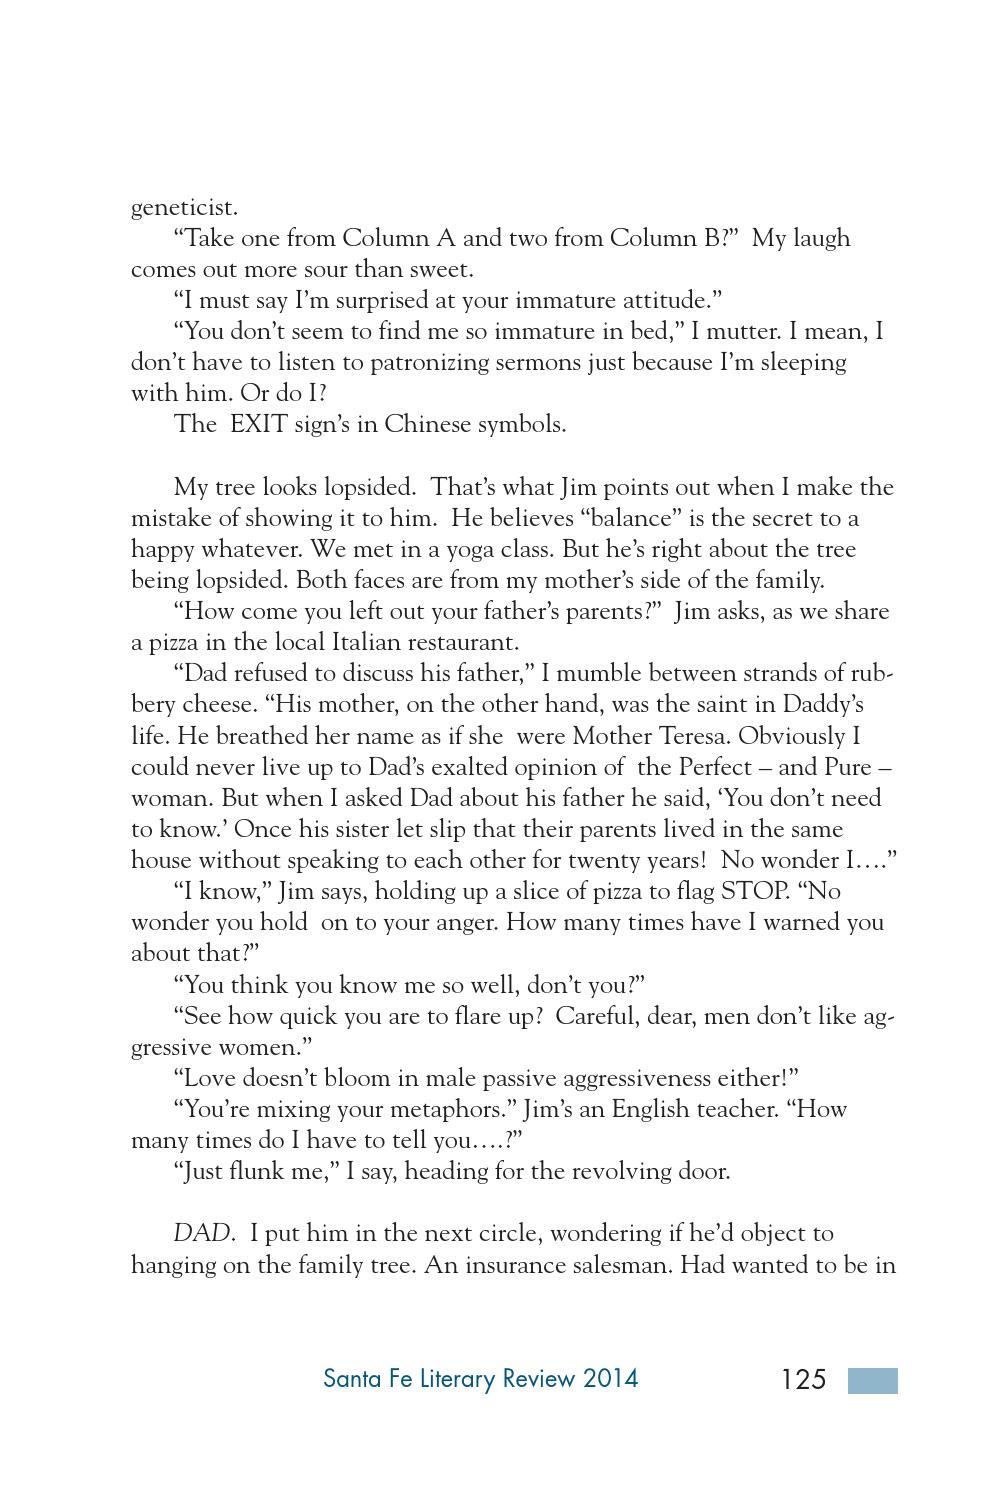 Santa Fe Literary Review 2014 By Santa Fe Community College Issuu